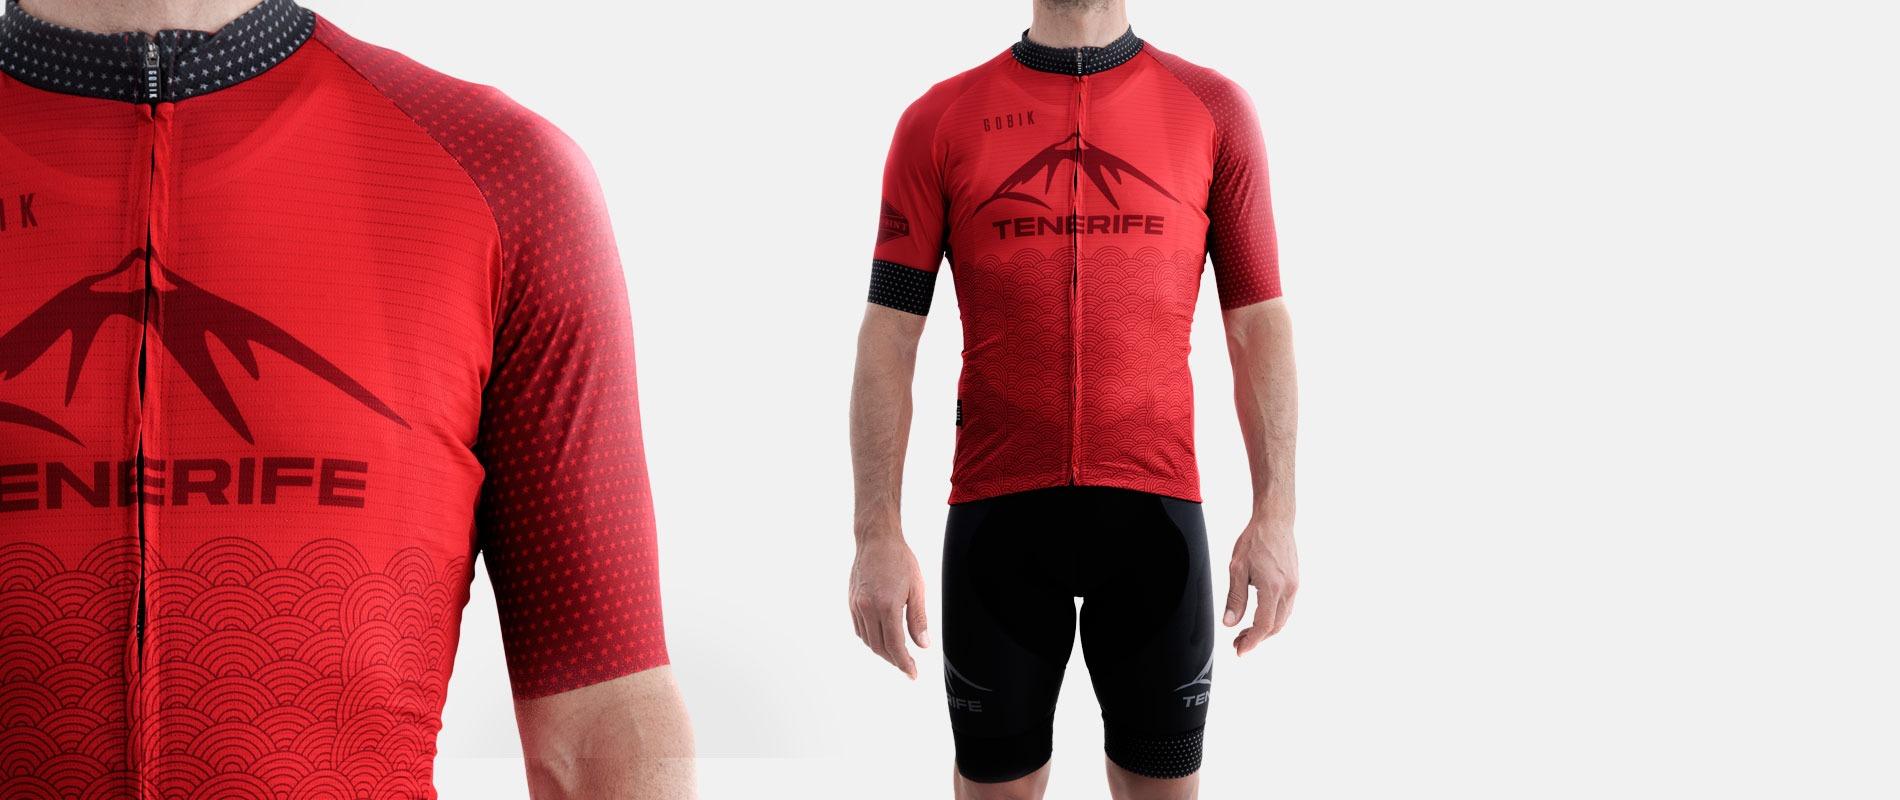 Gobik Male Red Jersey Maillot Splash Bike Point Tenerife Bike Hire & Bike Rental